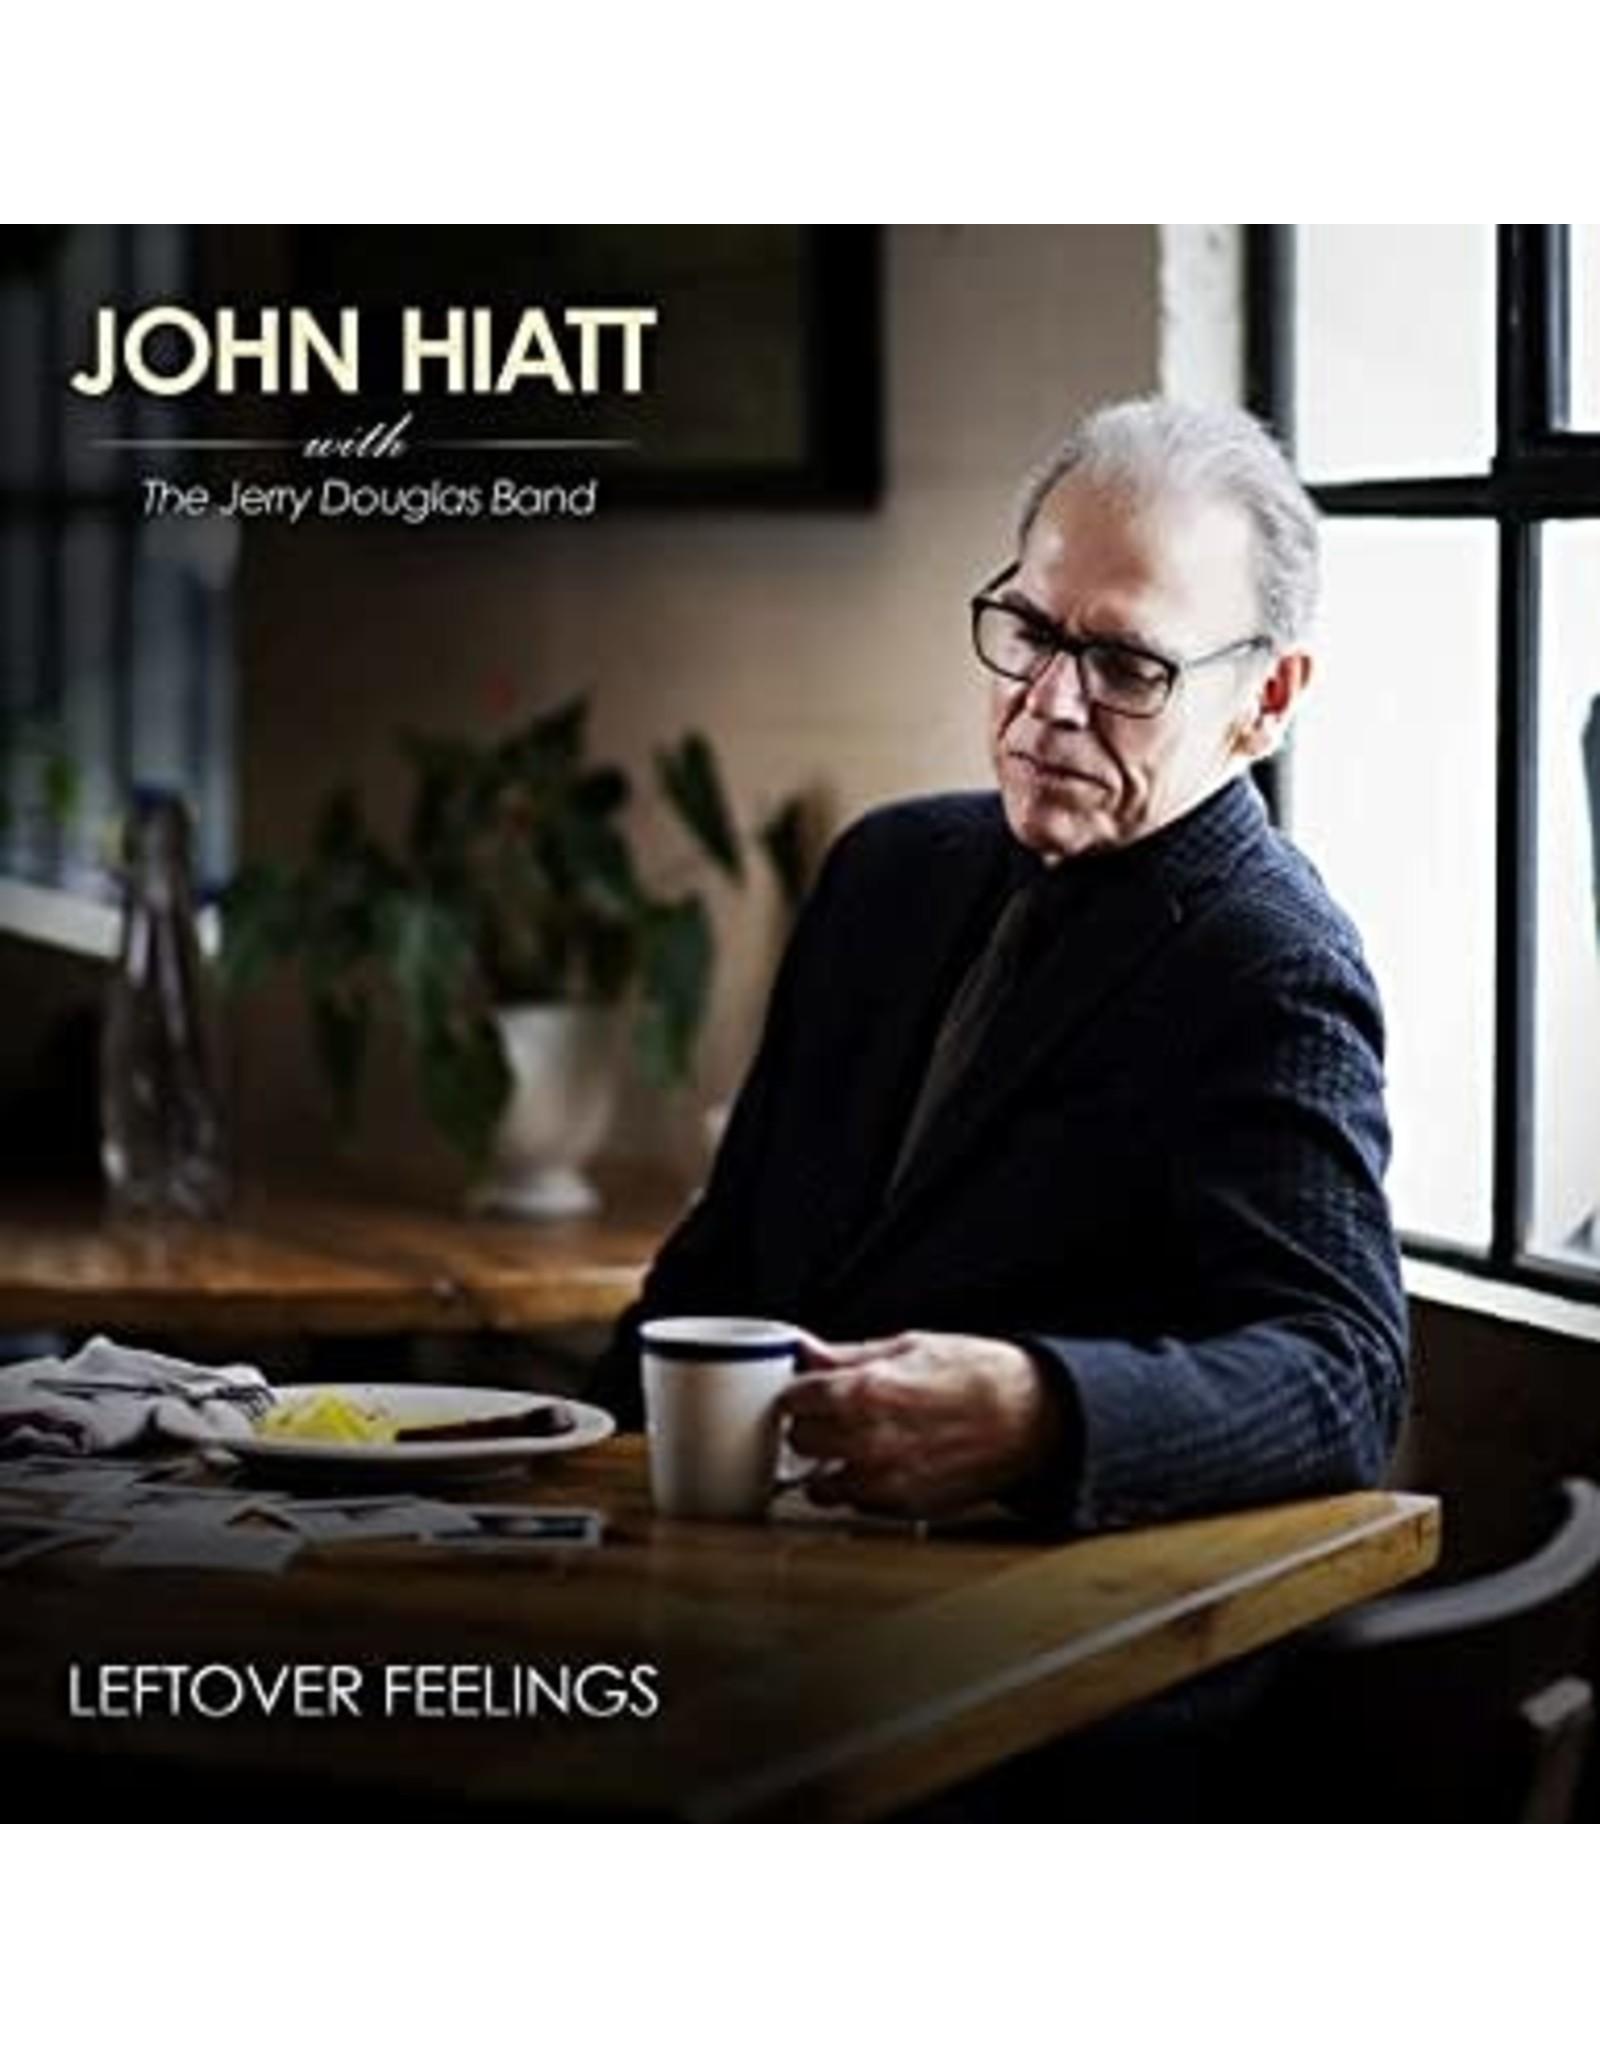 HIatt, John with The Jerry Douglas Band - Leftover Feelings CD